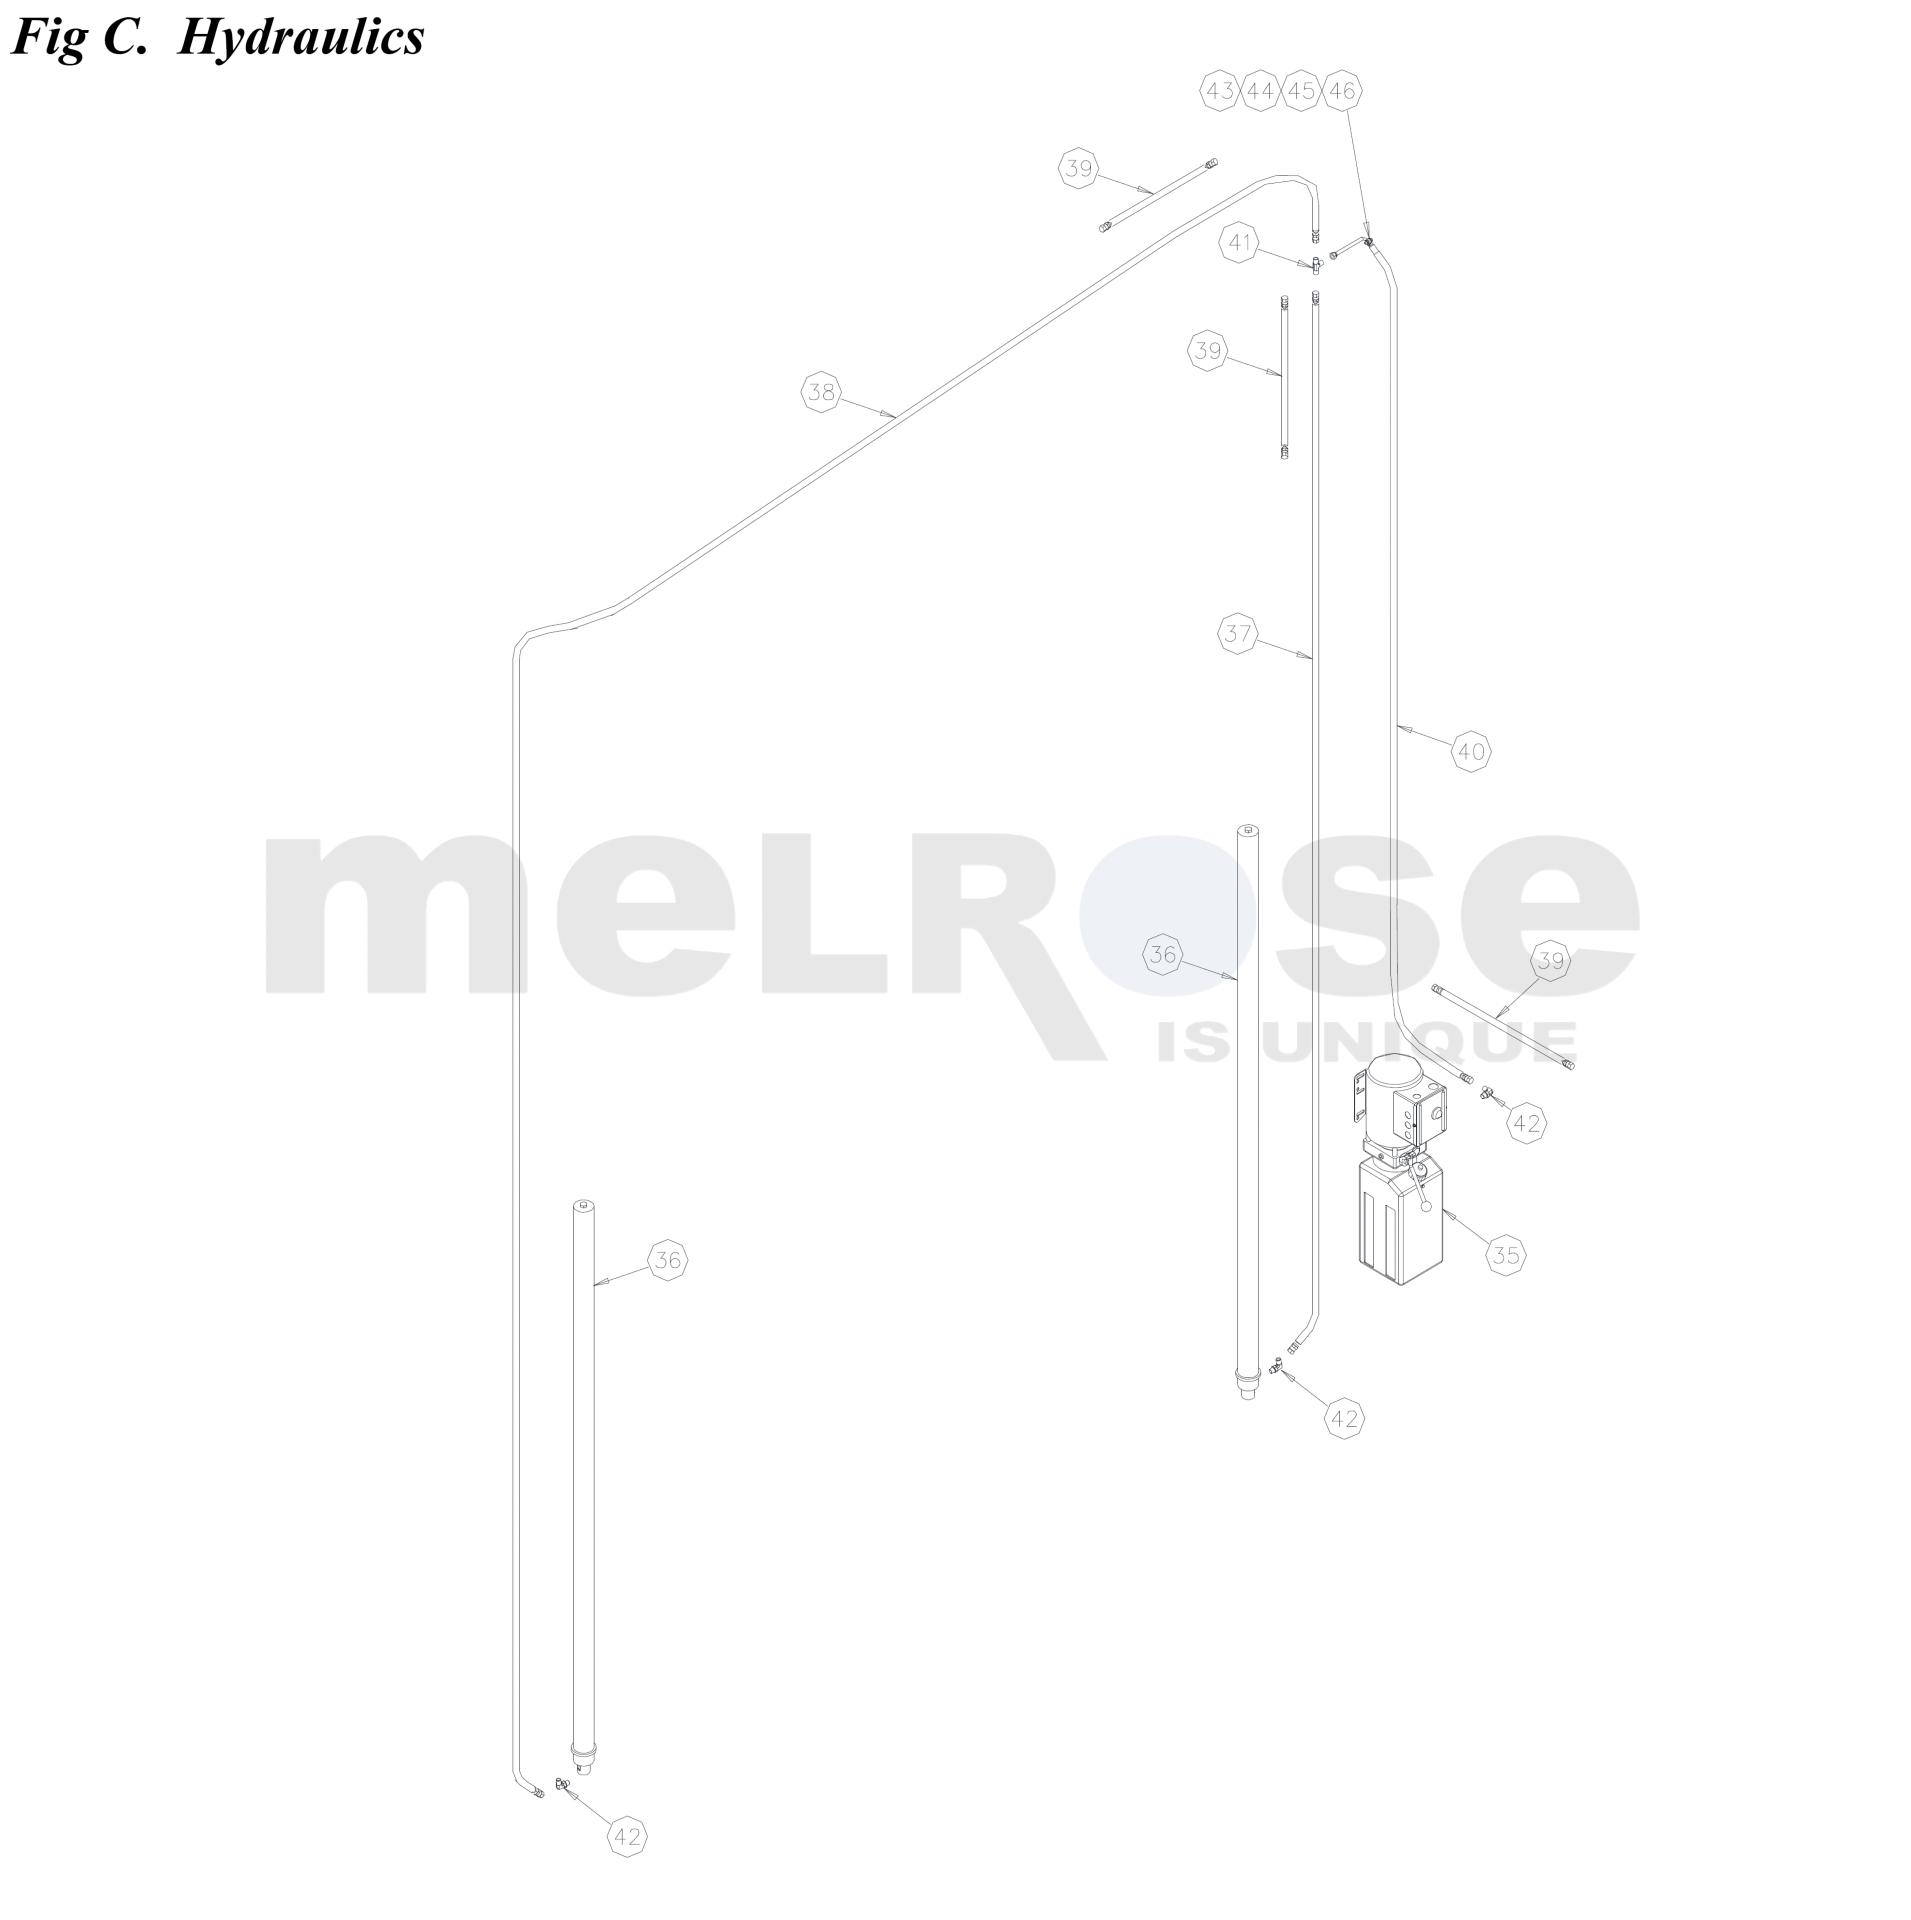 cl10-hydraulics-diagram-ii-marked.jpg